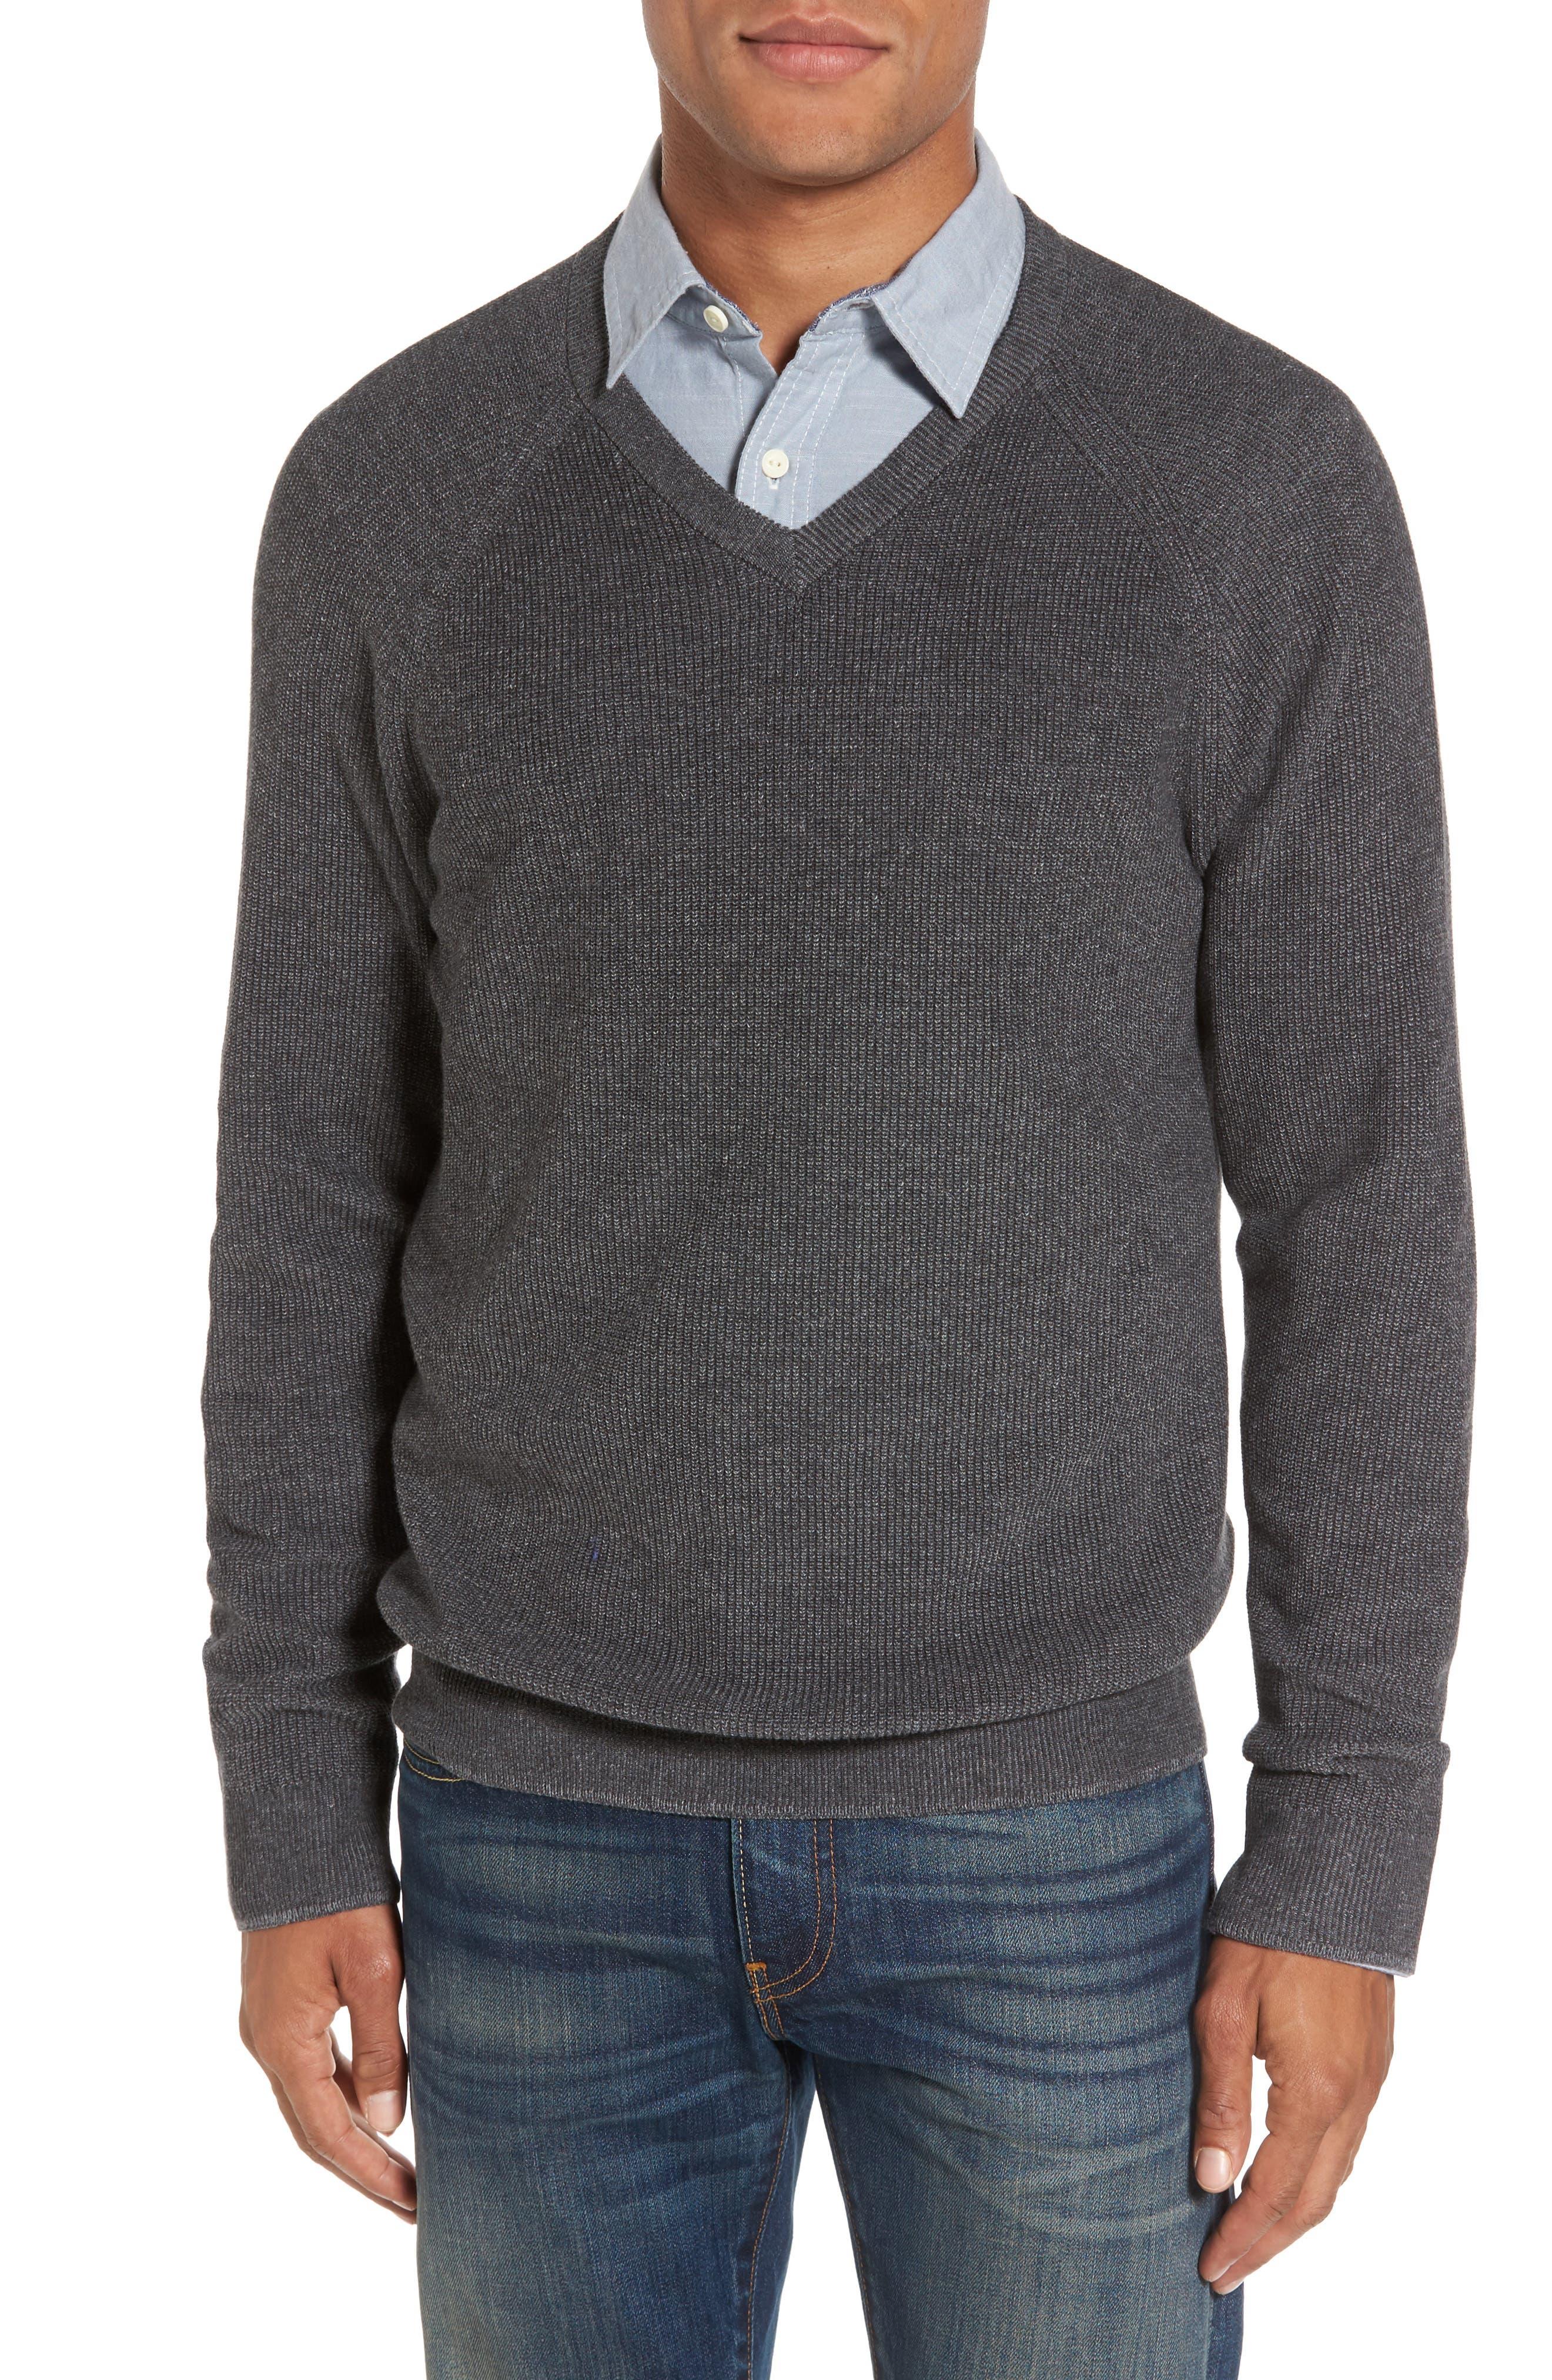 Supima<sup>®</sup> Cotton V-Neck Sweater,                             Main thumbnail 1, color,                             021